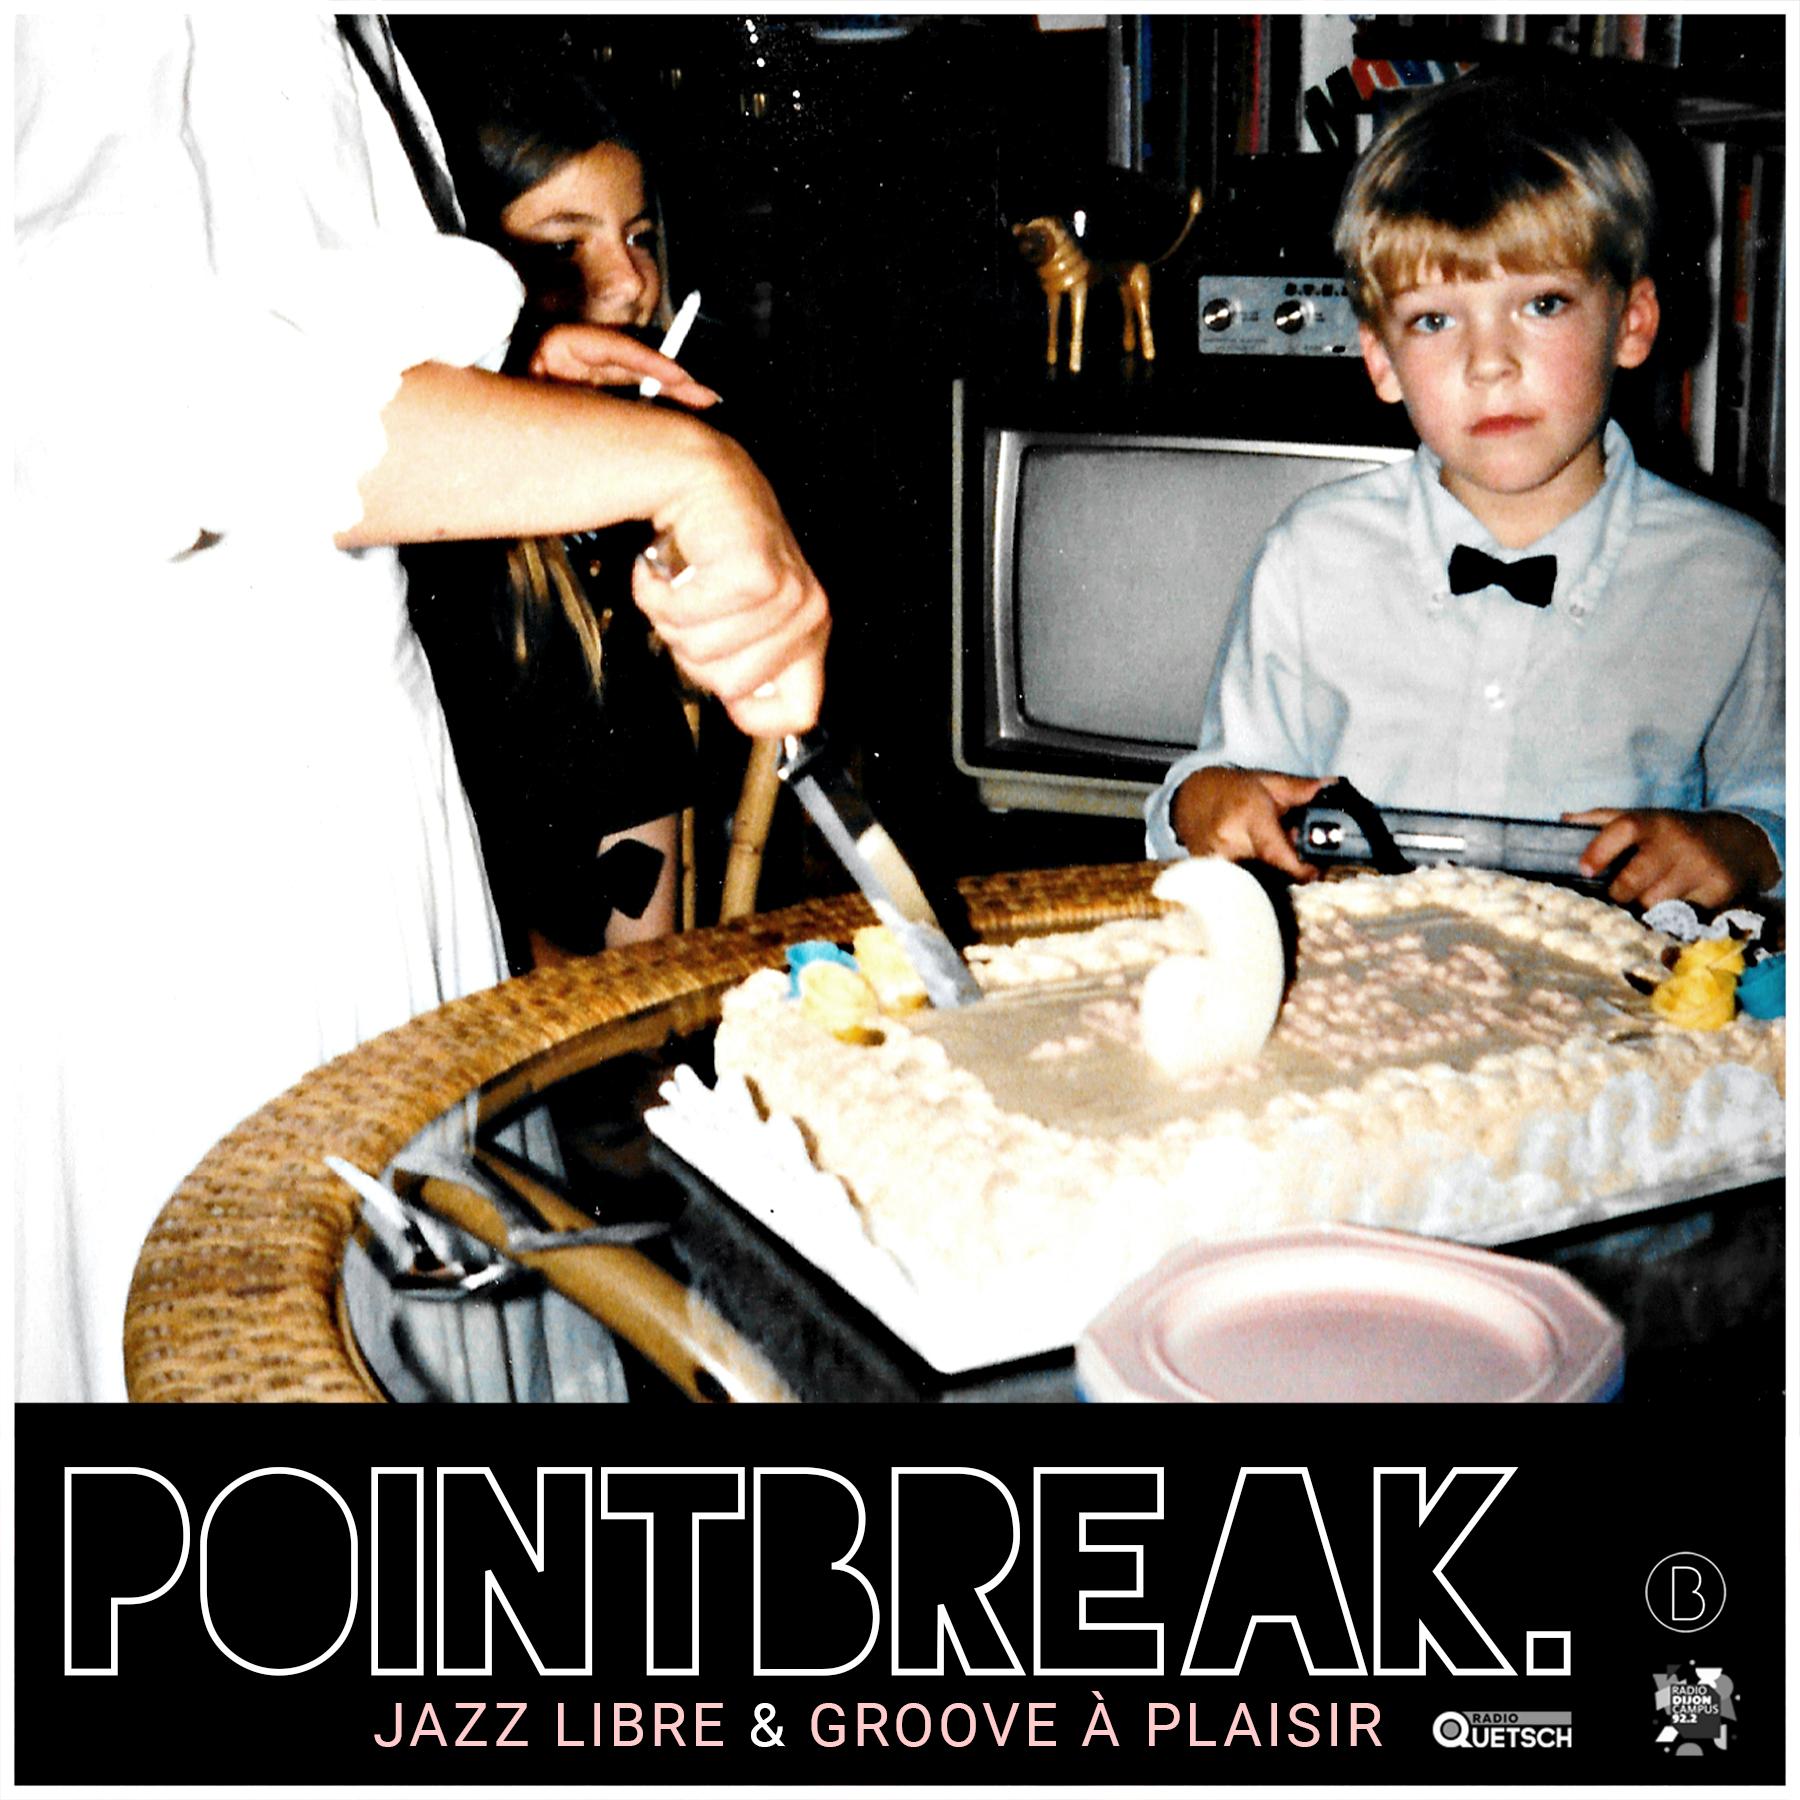 PointBreak, Radio Mix S04 E03